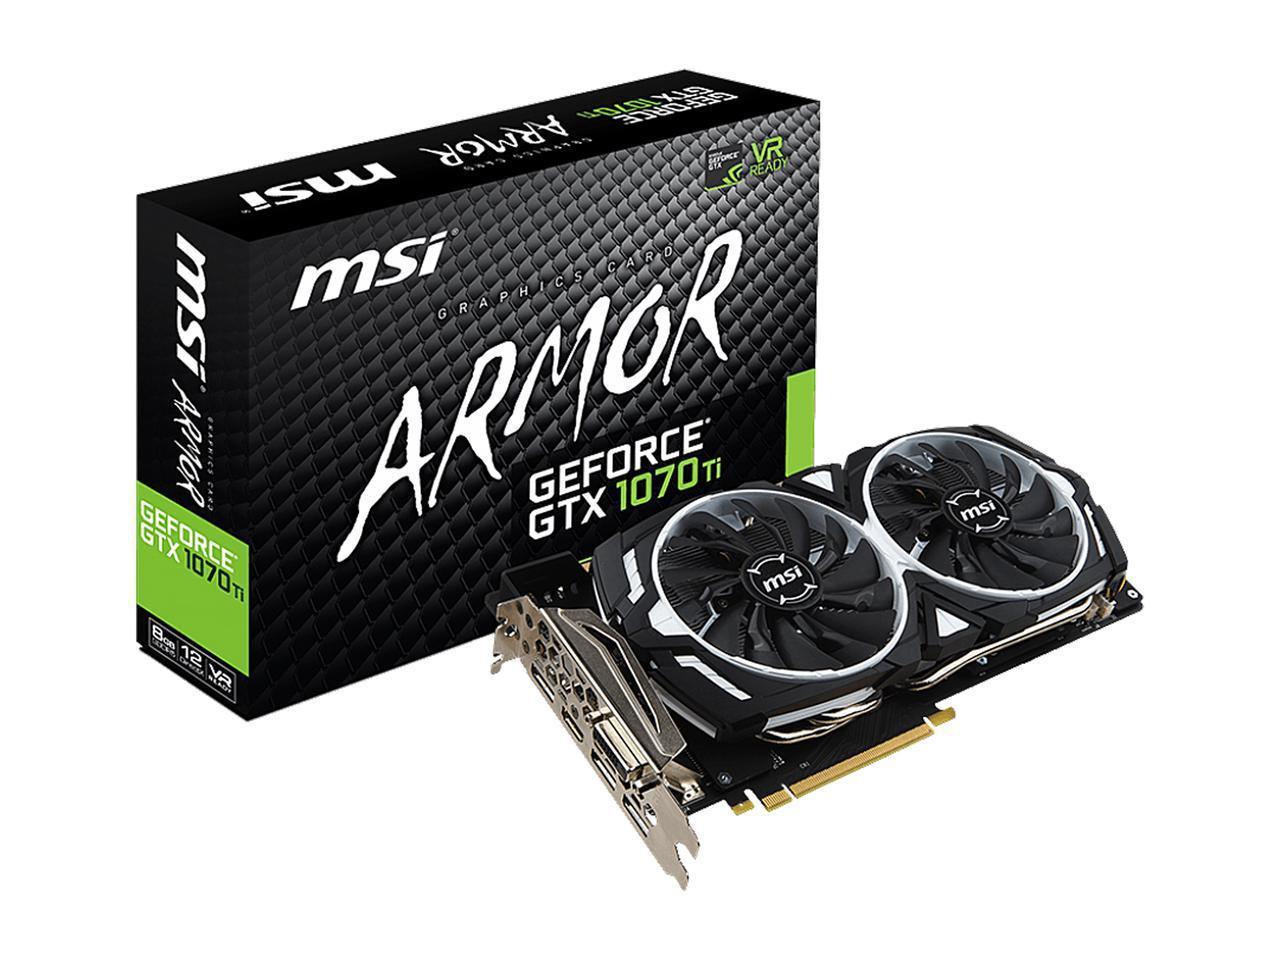 MSI GeForce GTX 1070 TI ARMOR 8G 8GB 256-Bit GDDR5 PCI Express 3 0 x16 HDCP  Ready SLI Support Graphics Card (1 Year Warranty)